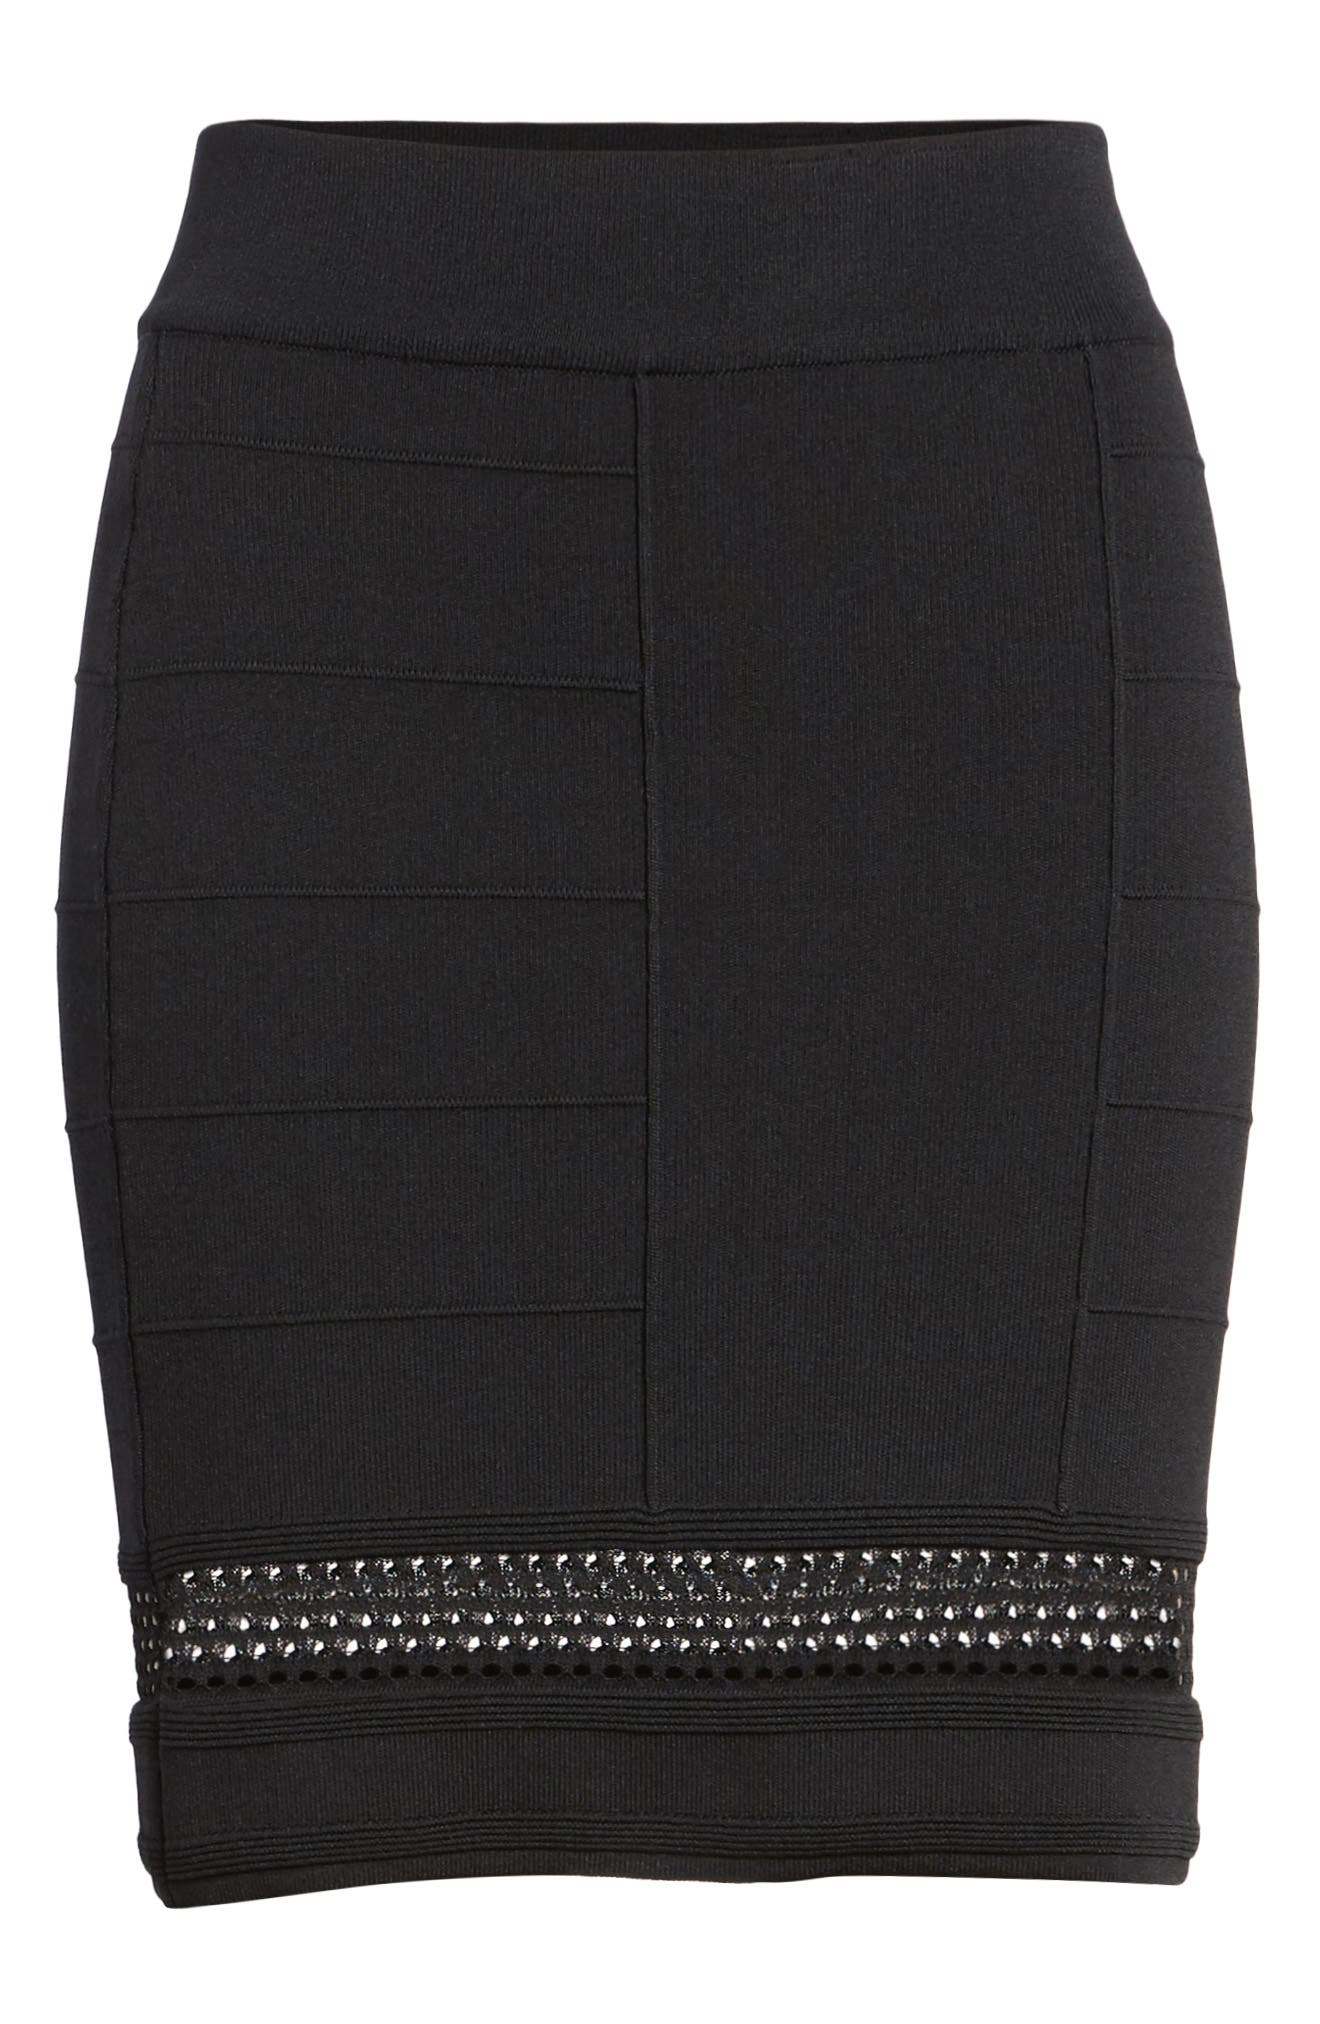 Bishop + Young Siena Peekaboo Skirt,                             Alternate thumbnail 6, color,                             Black